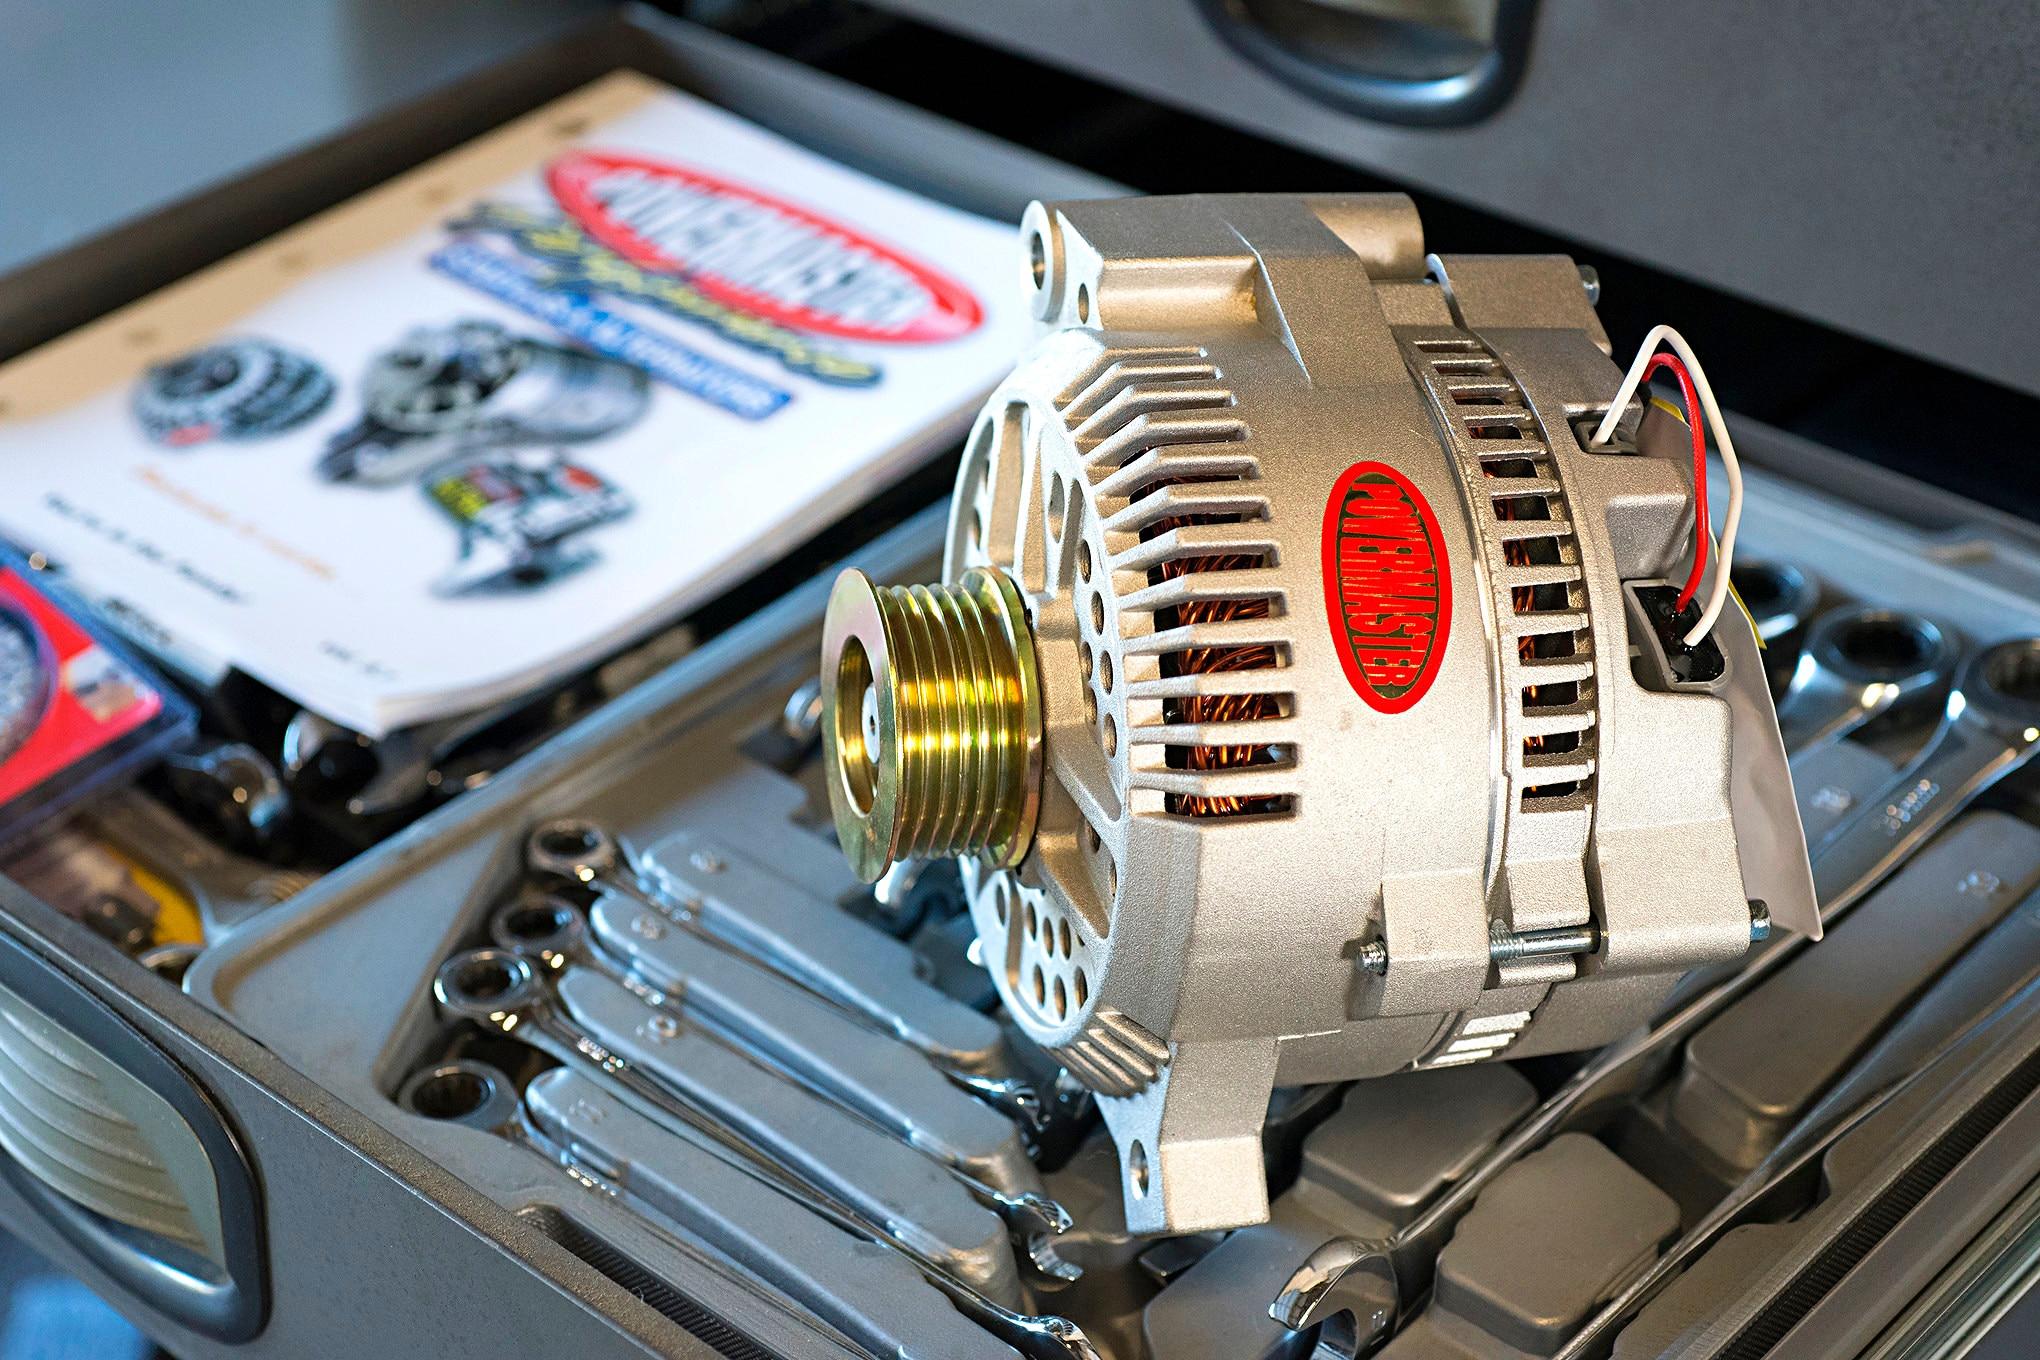 ford alternator upgrade for more battery charging power